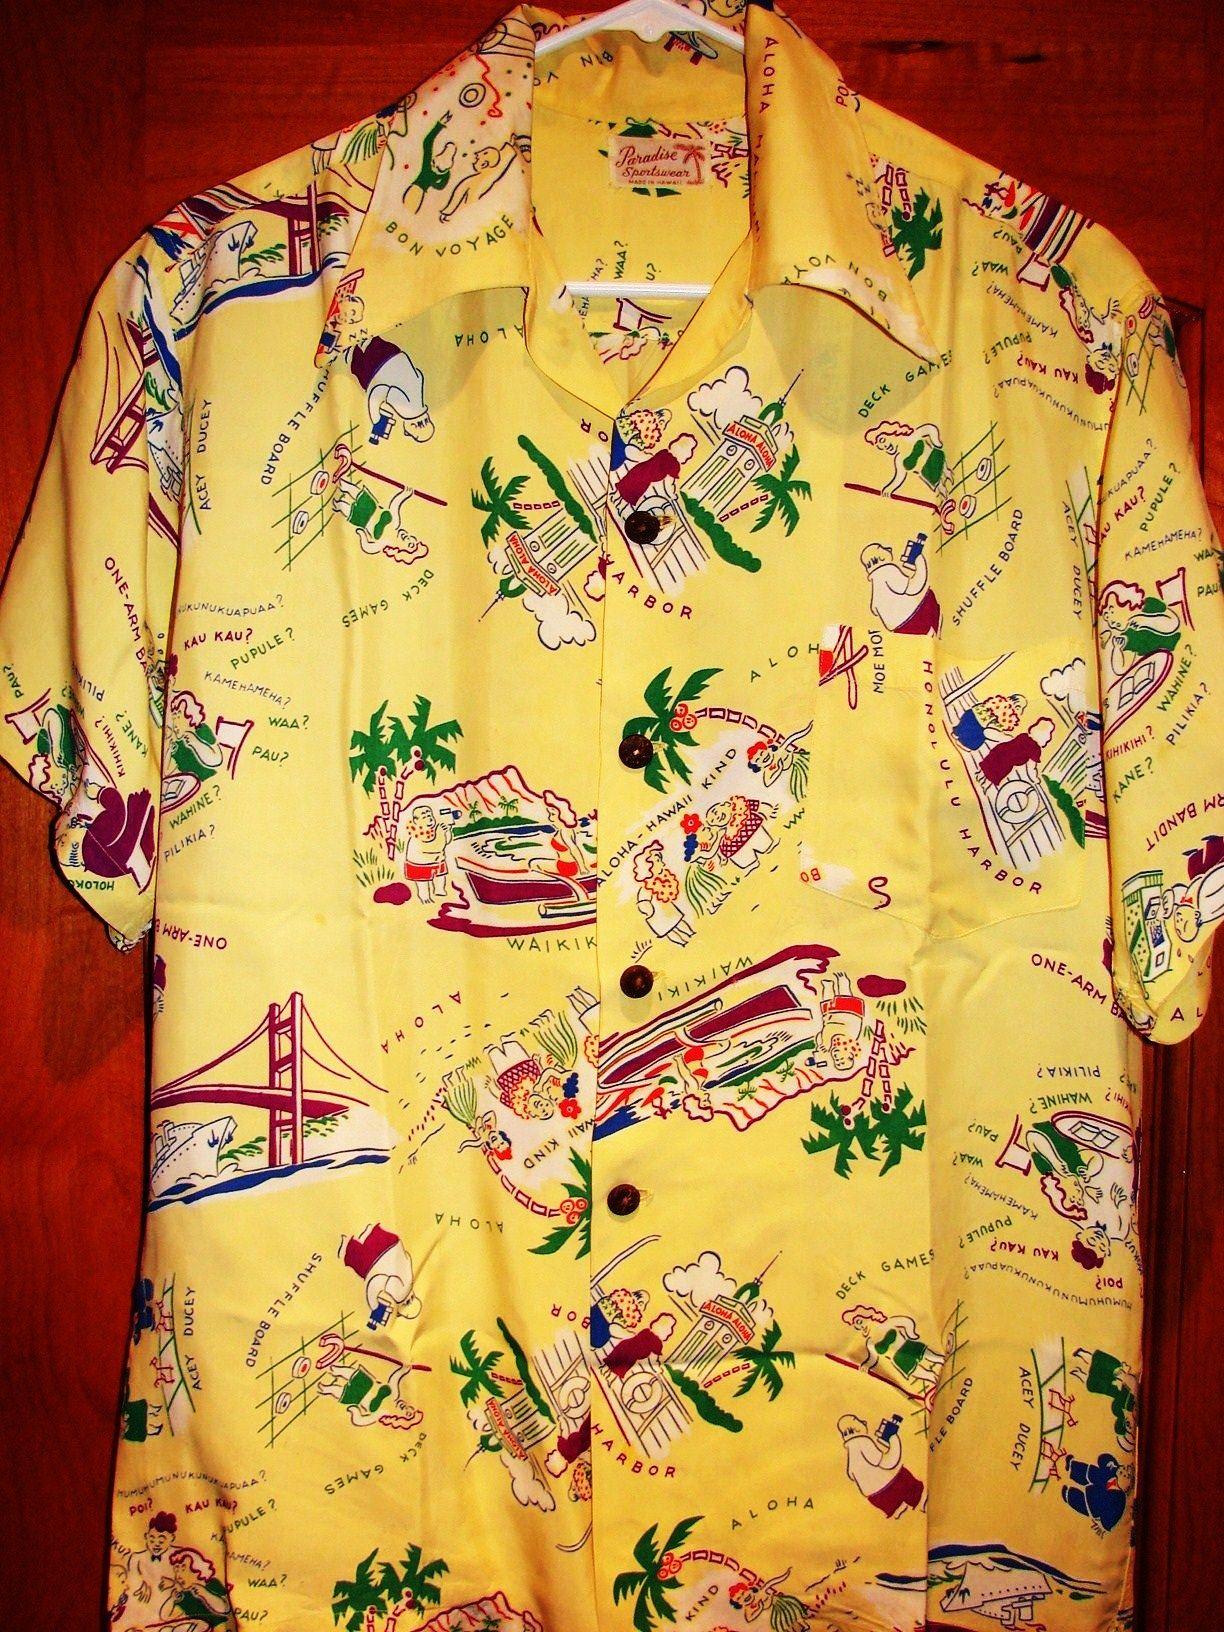 47755be7 Pacific Sportswear - 40s Malihini Rayon Vintage Hawaiian Shirt -  TheHanaShirtCo